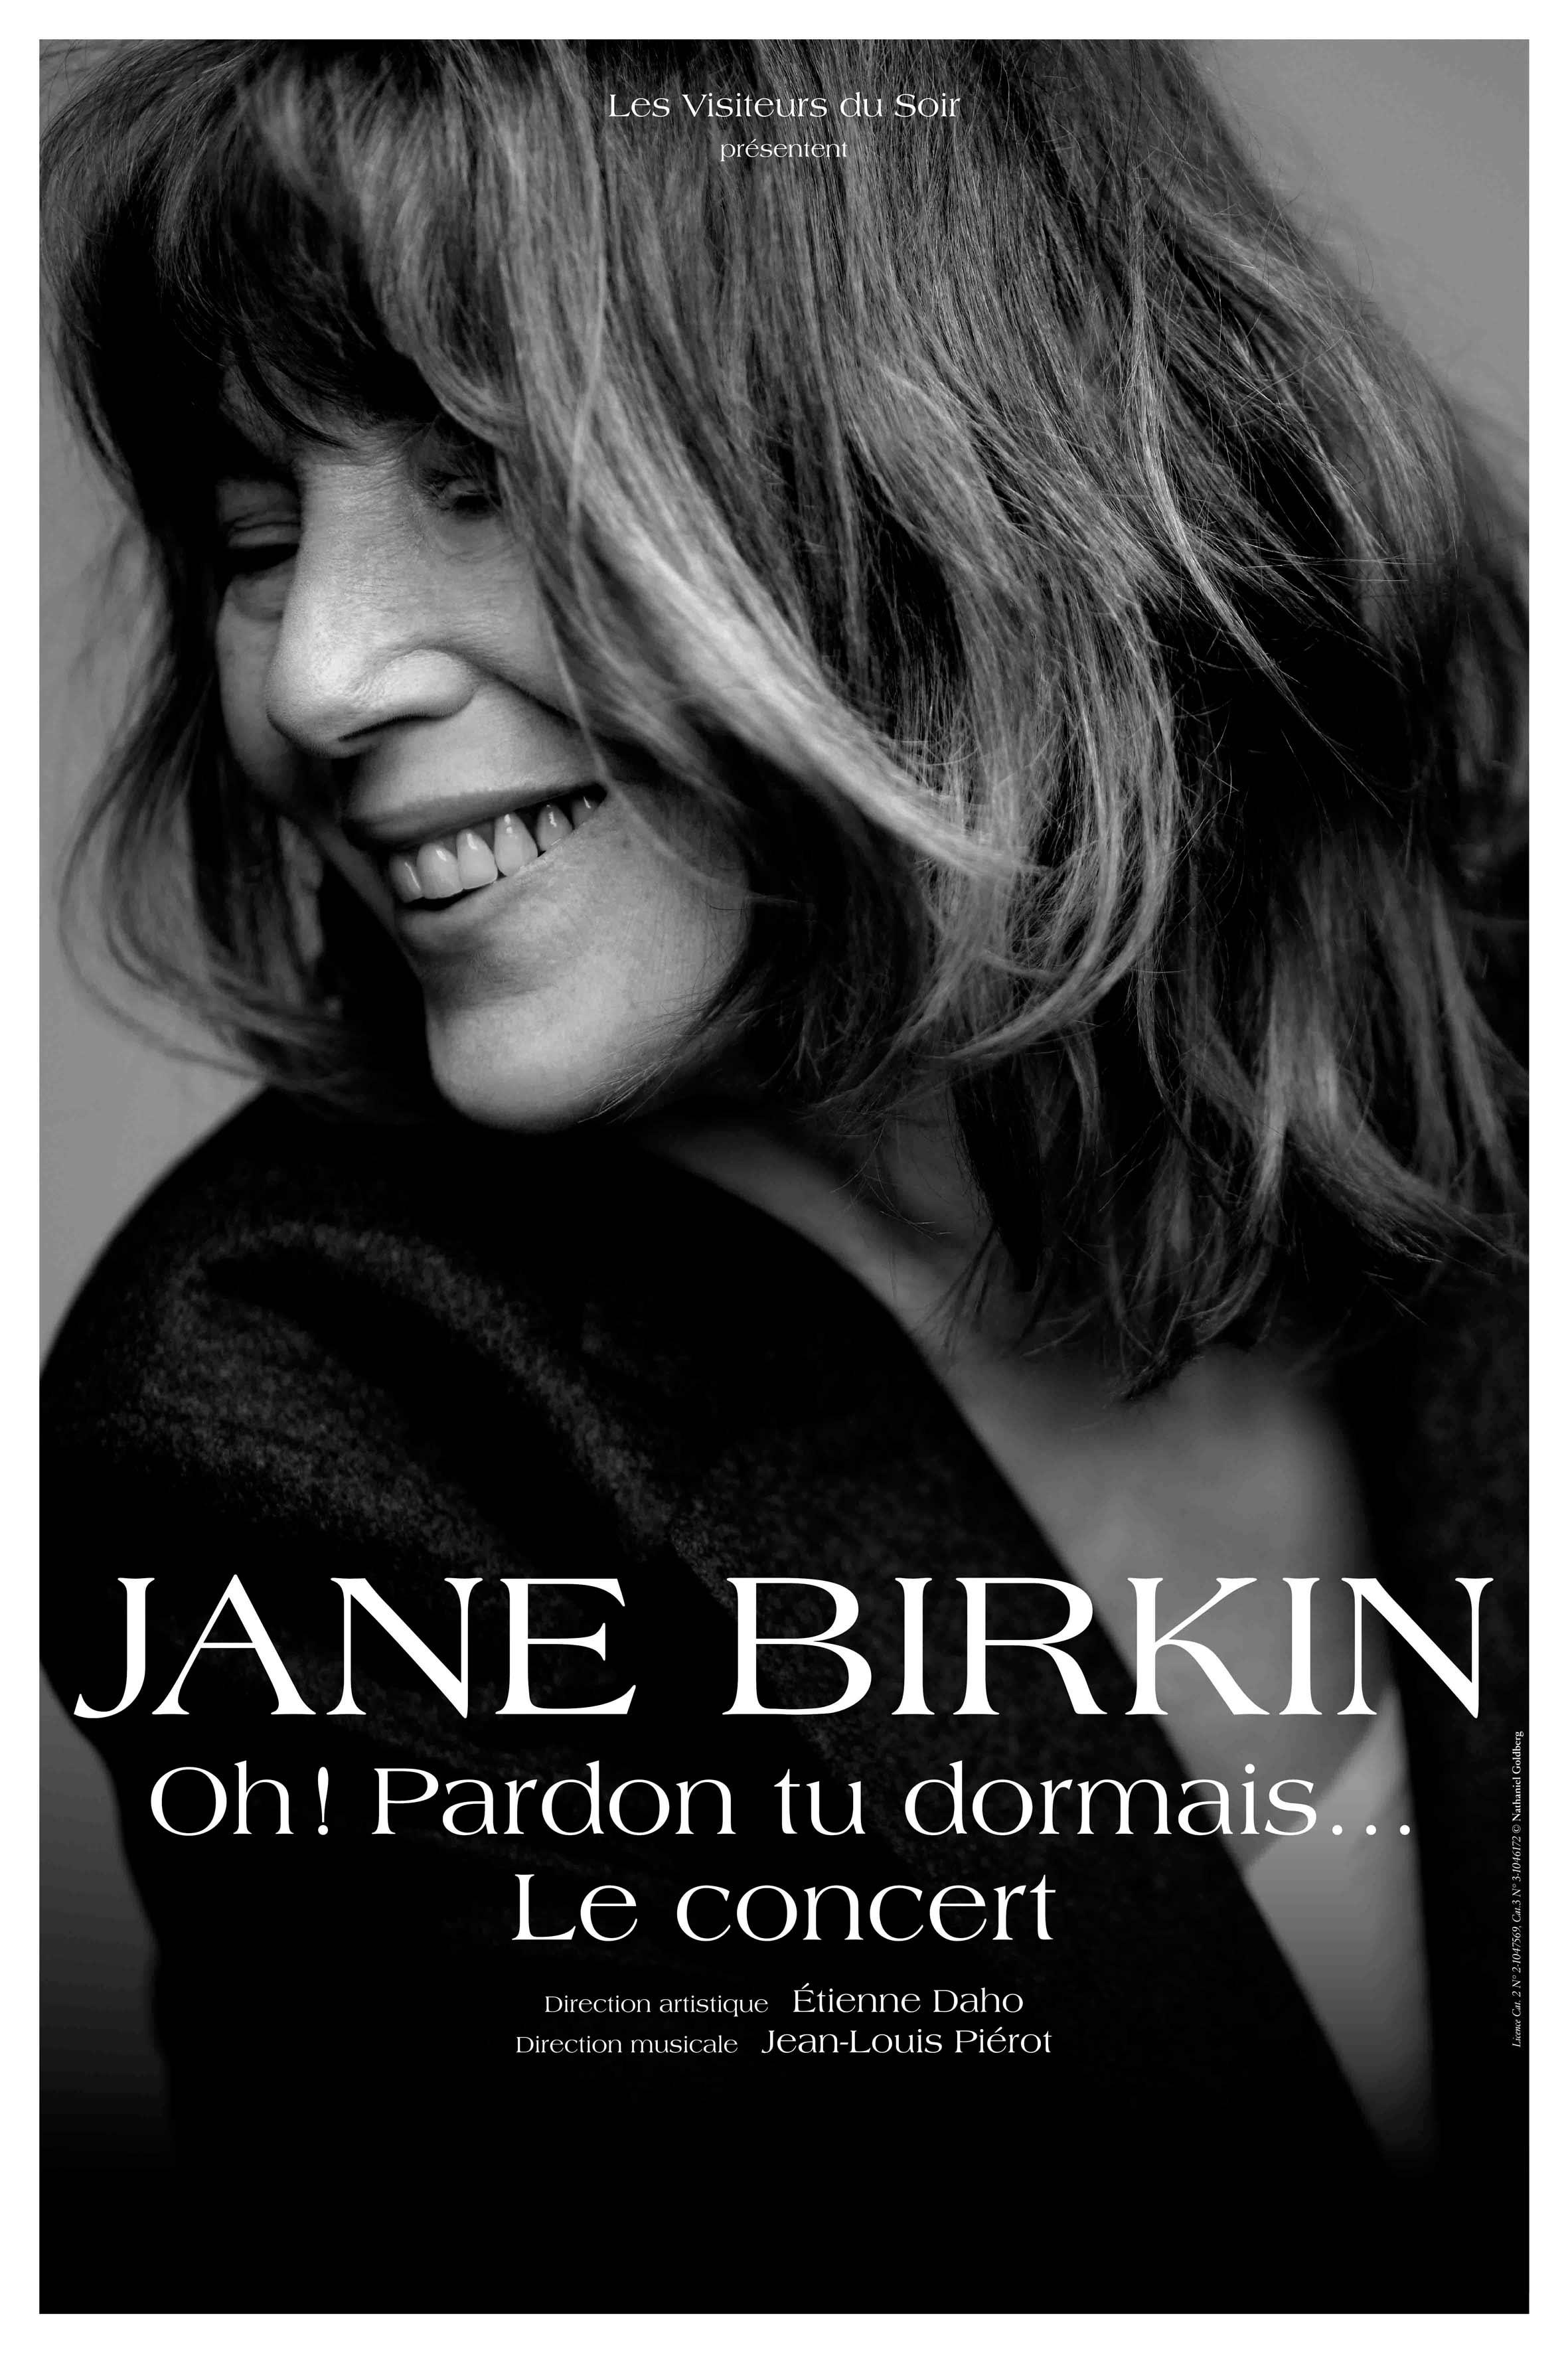 Limoges : Jane Birkin : Oh pardon tu dormais...